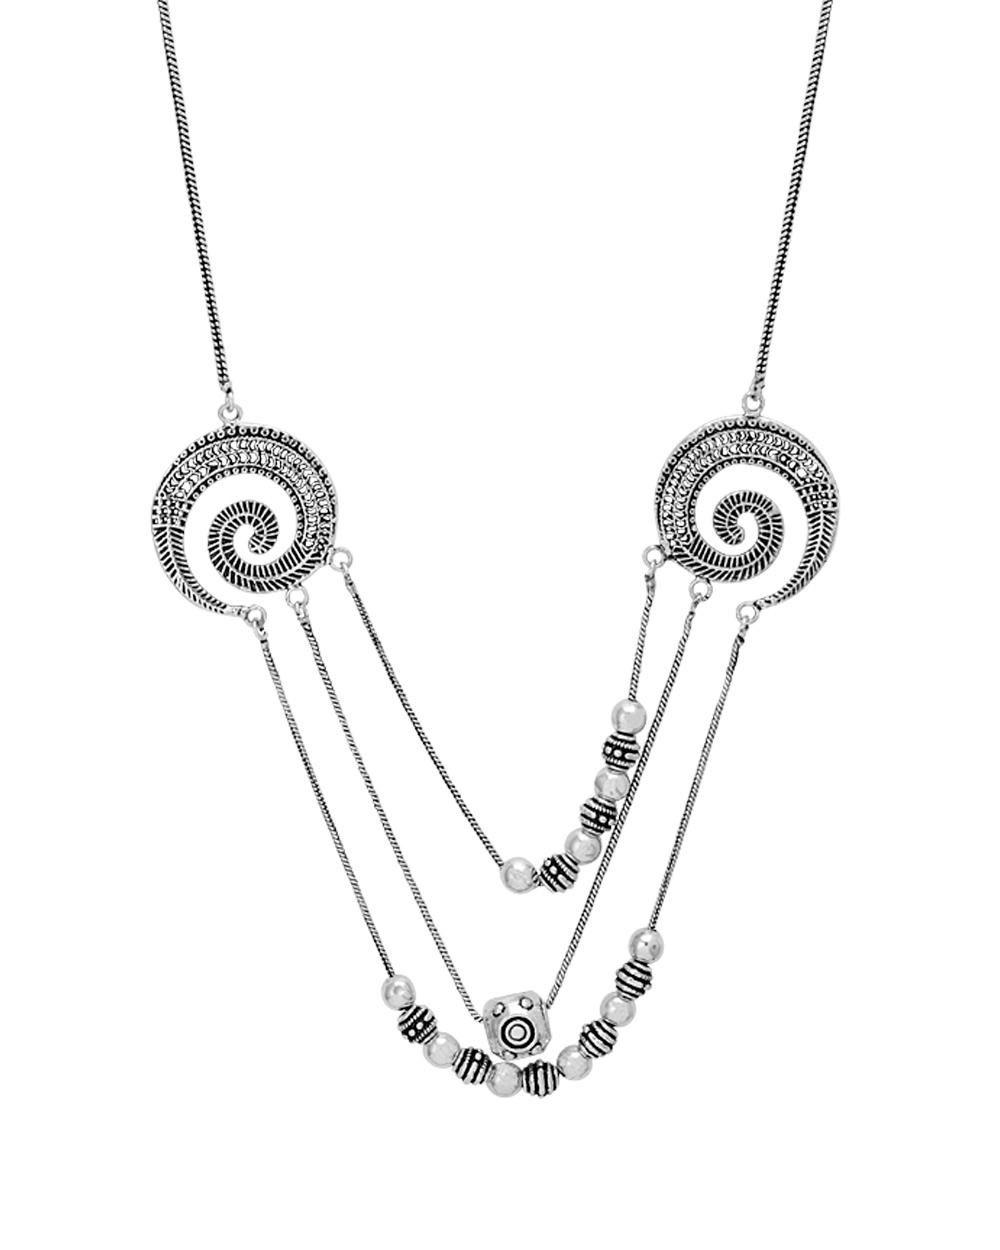 Voylla Designer Statement Necklace With Oxidized Finish